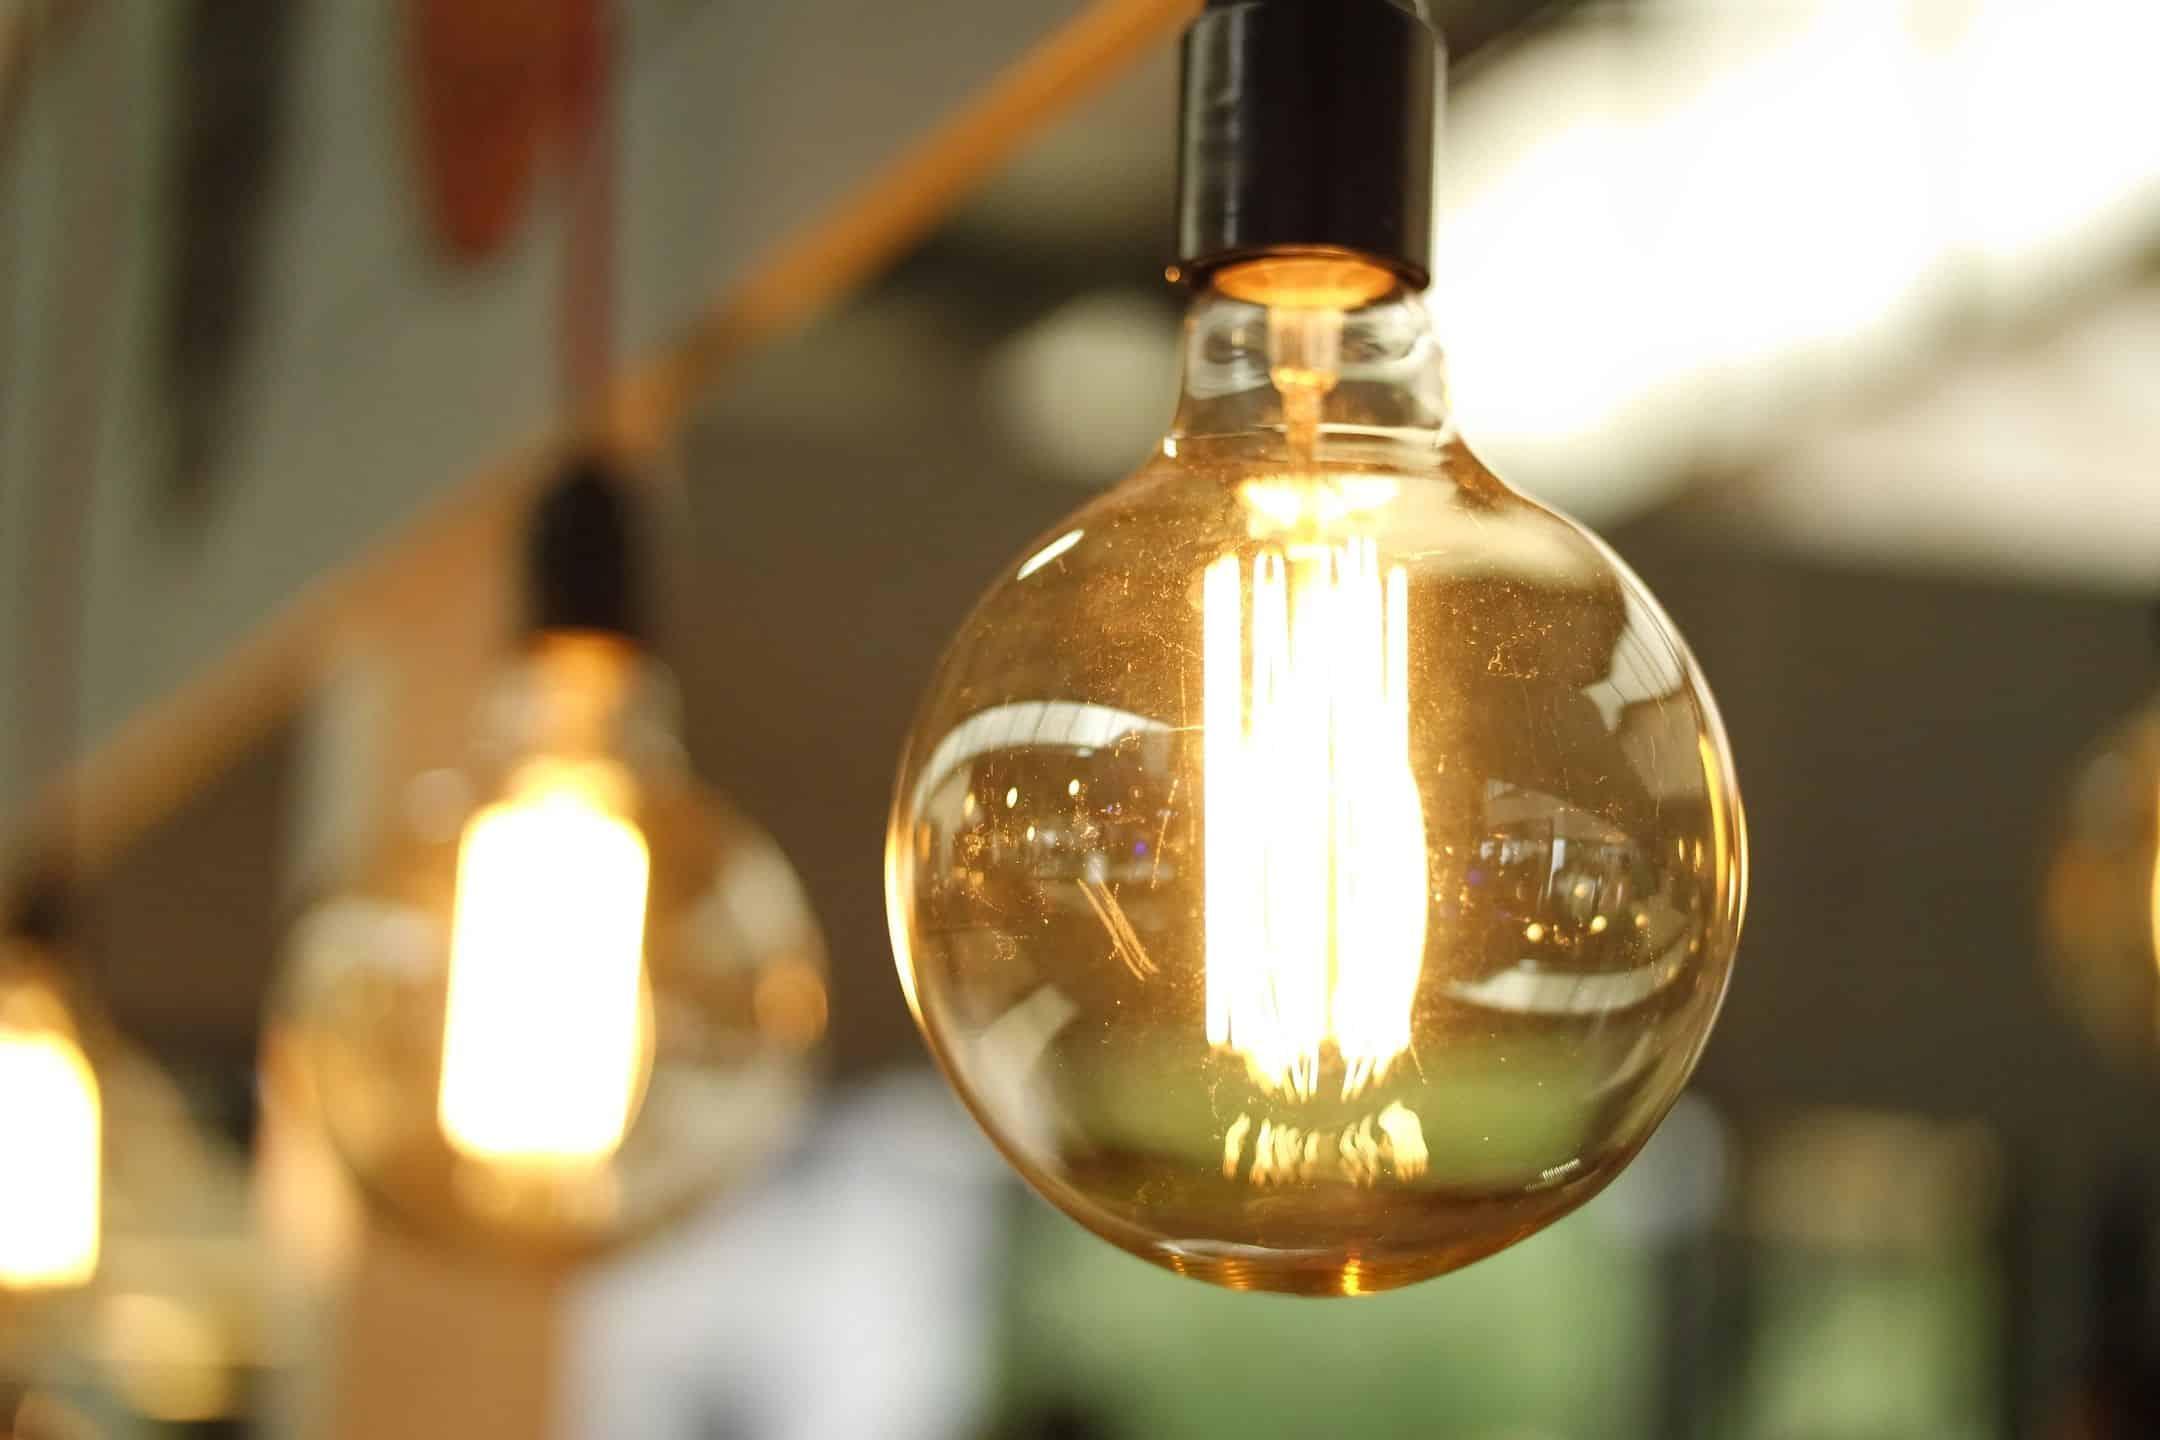 residential electrician in Spokane and Coeur d' Alene